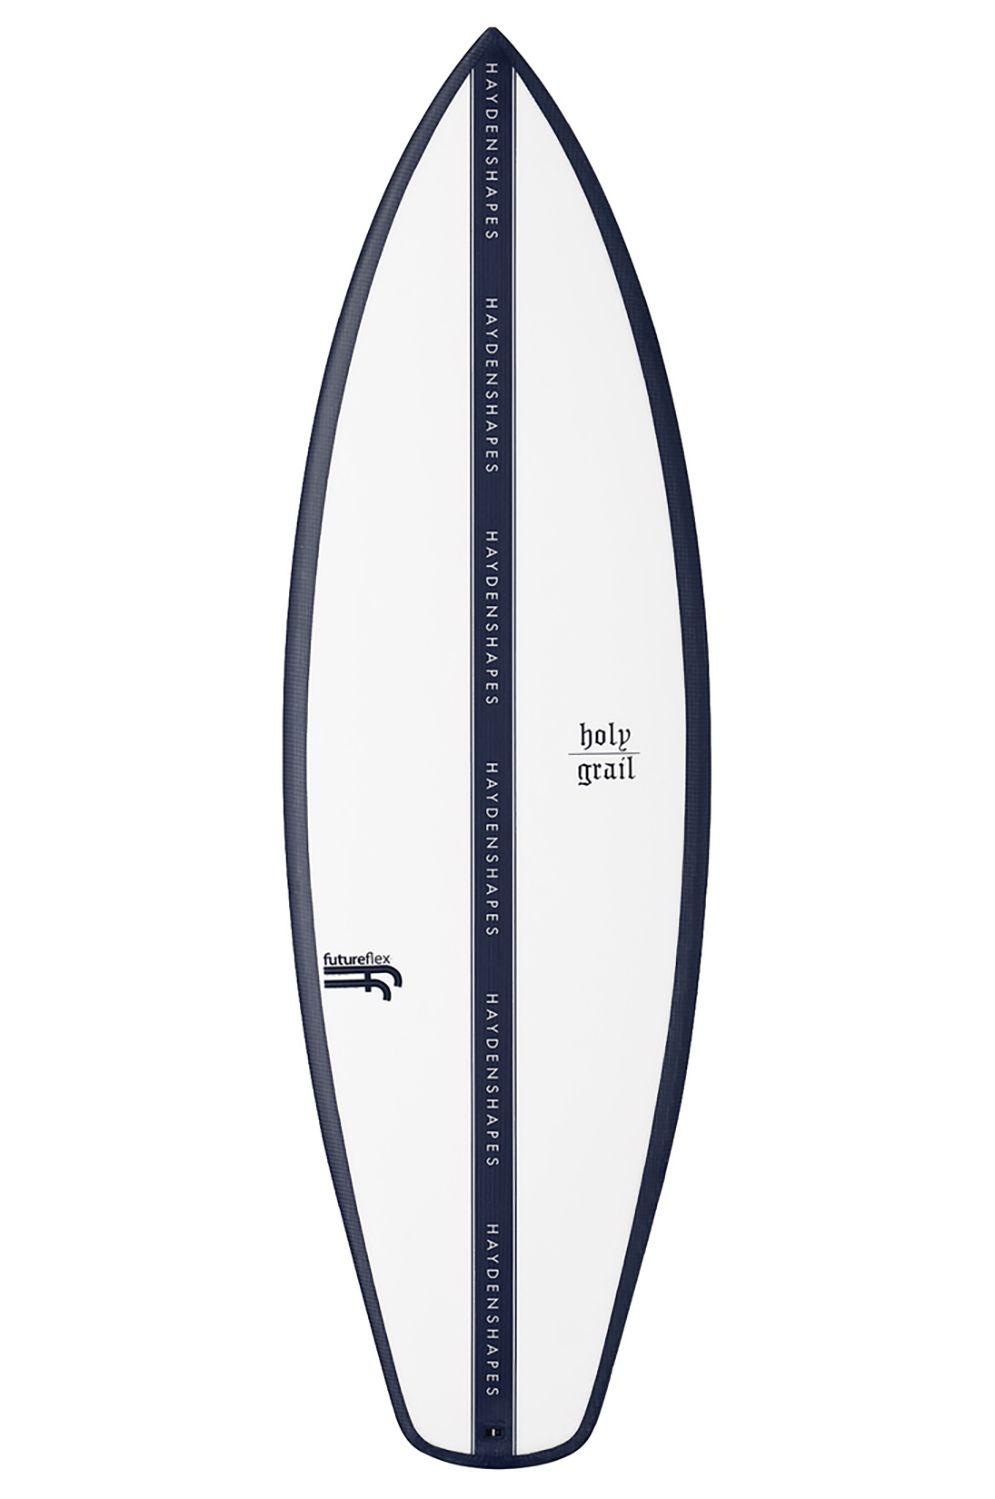 Haydenshapes Surf Board 5'5 HOLY GRAIL FF Squash Tail - Color FCS II Quad 5ft5